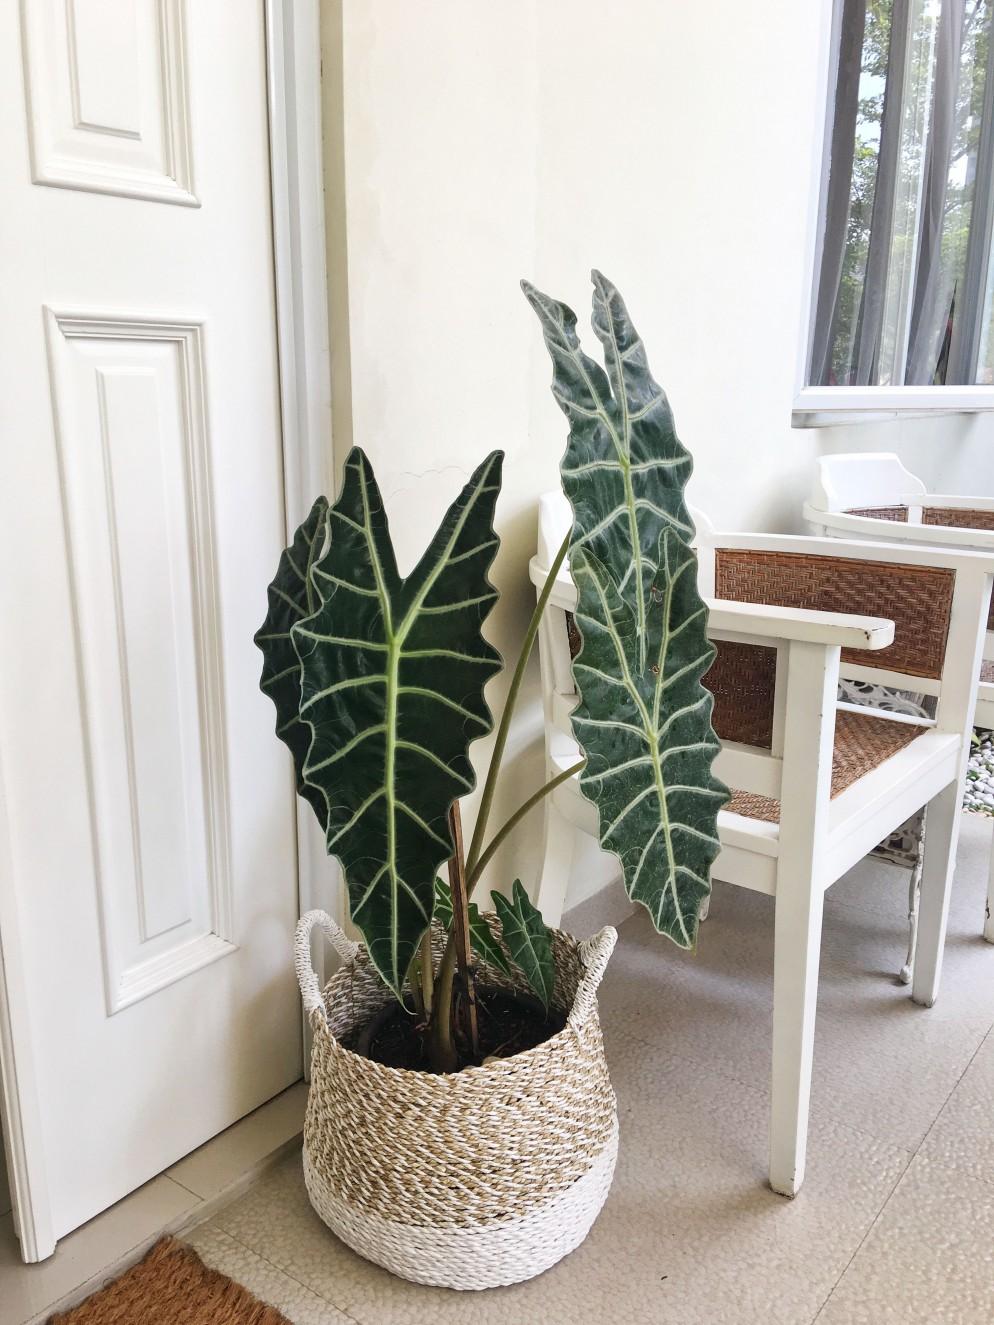 piante-da-interno-8. via pinterest-living-corriere